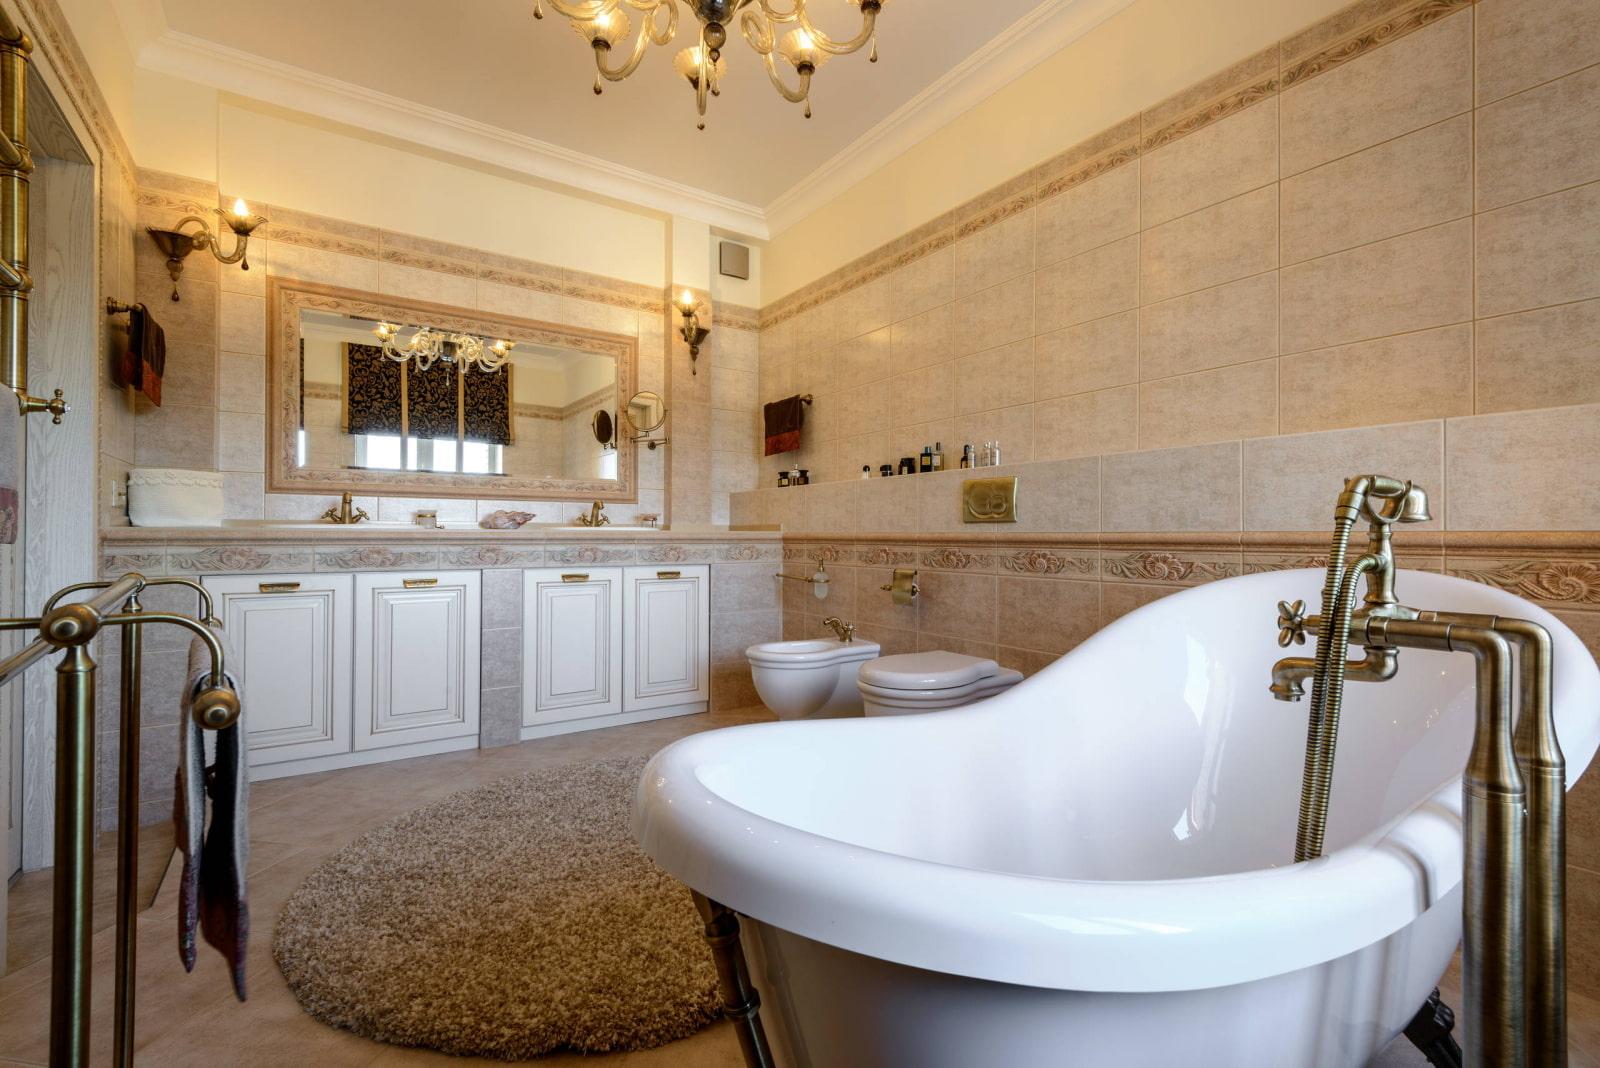 ванная комната в классическом стиле отделка потолка